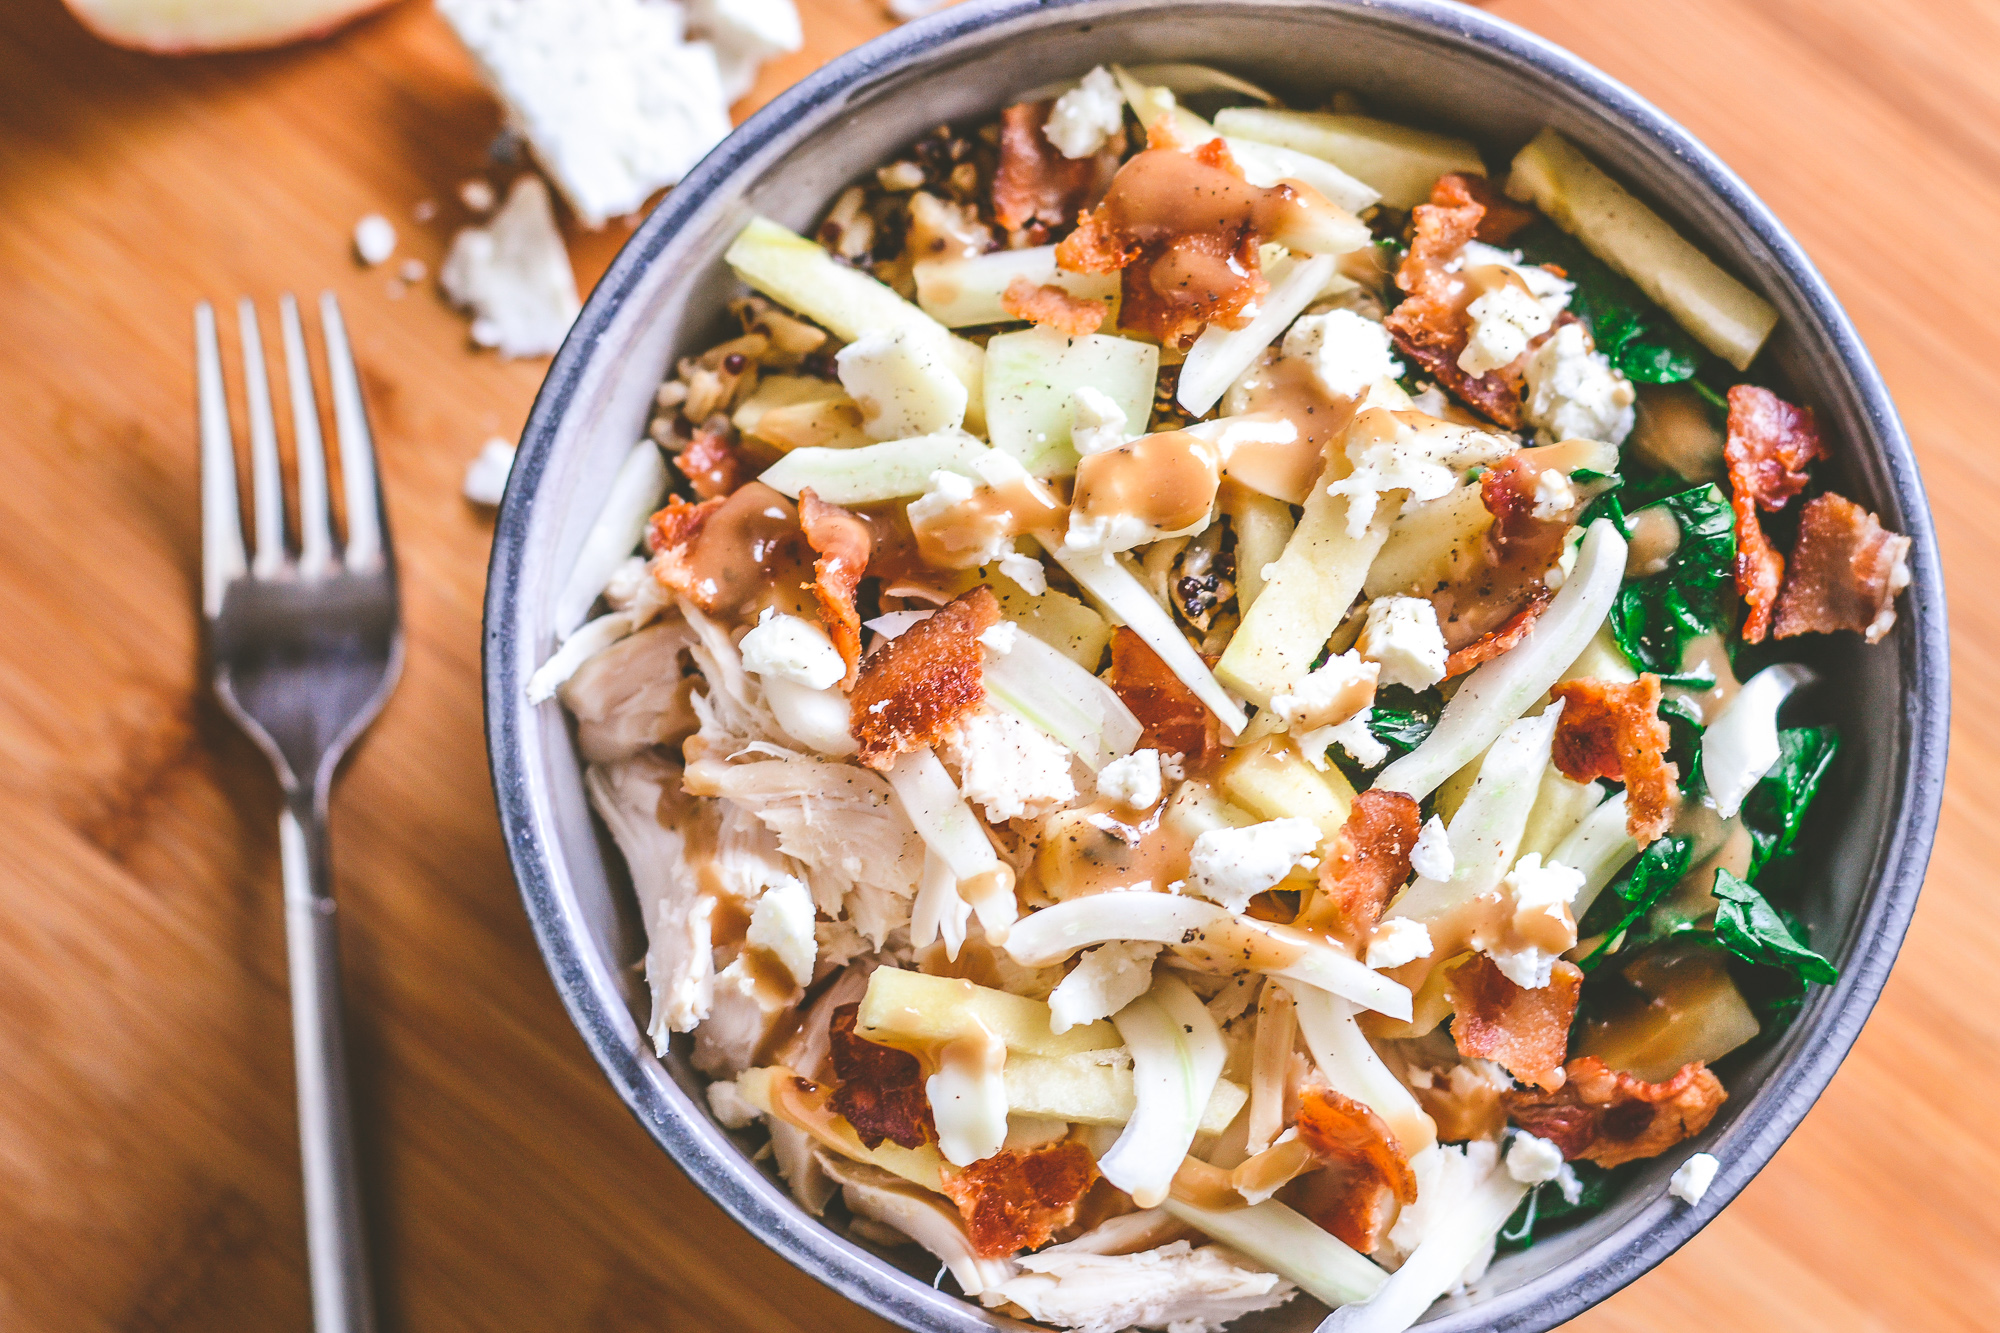 Warm Chicken, Apple and Fennel Power Bowls | Feel Good Food | BySarahRae.com